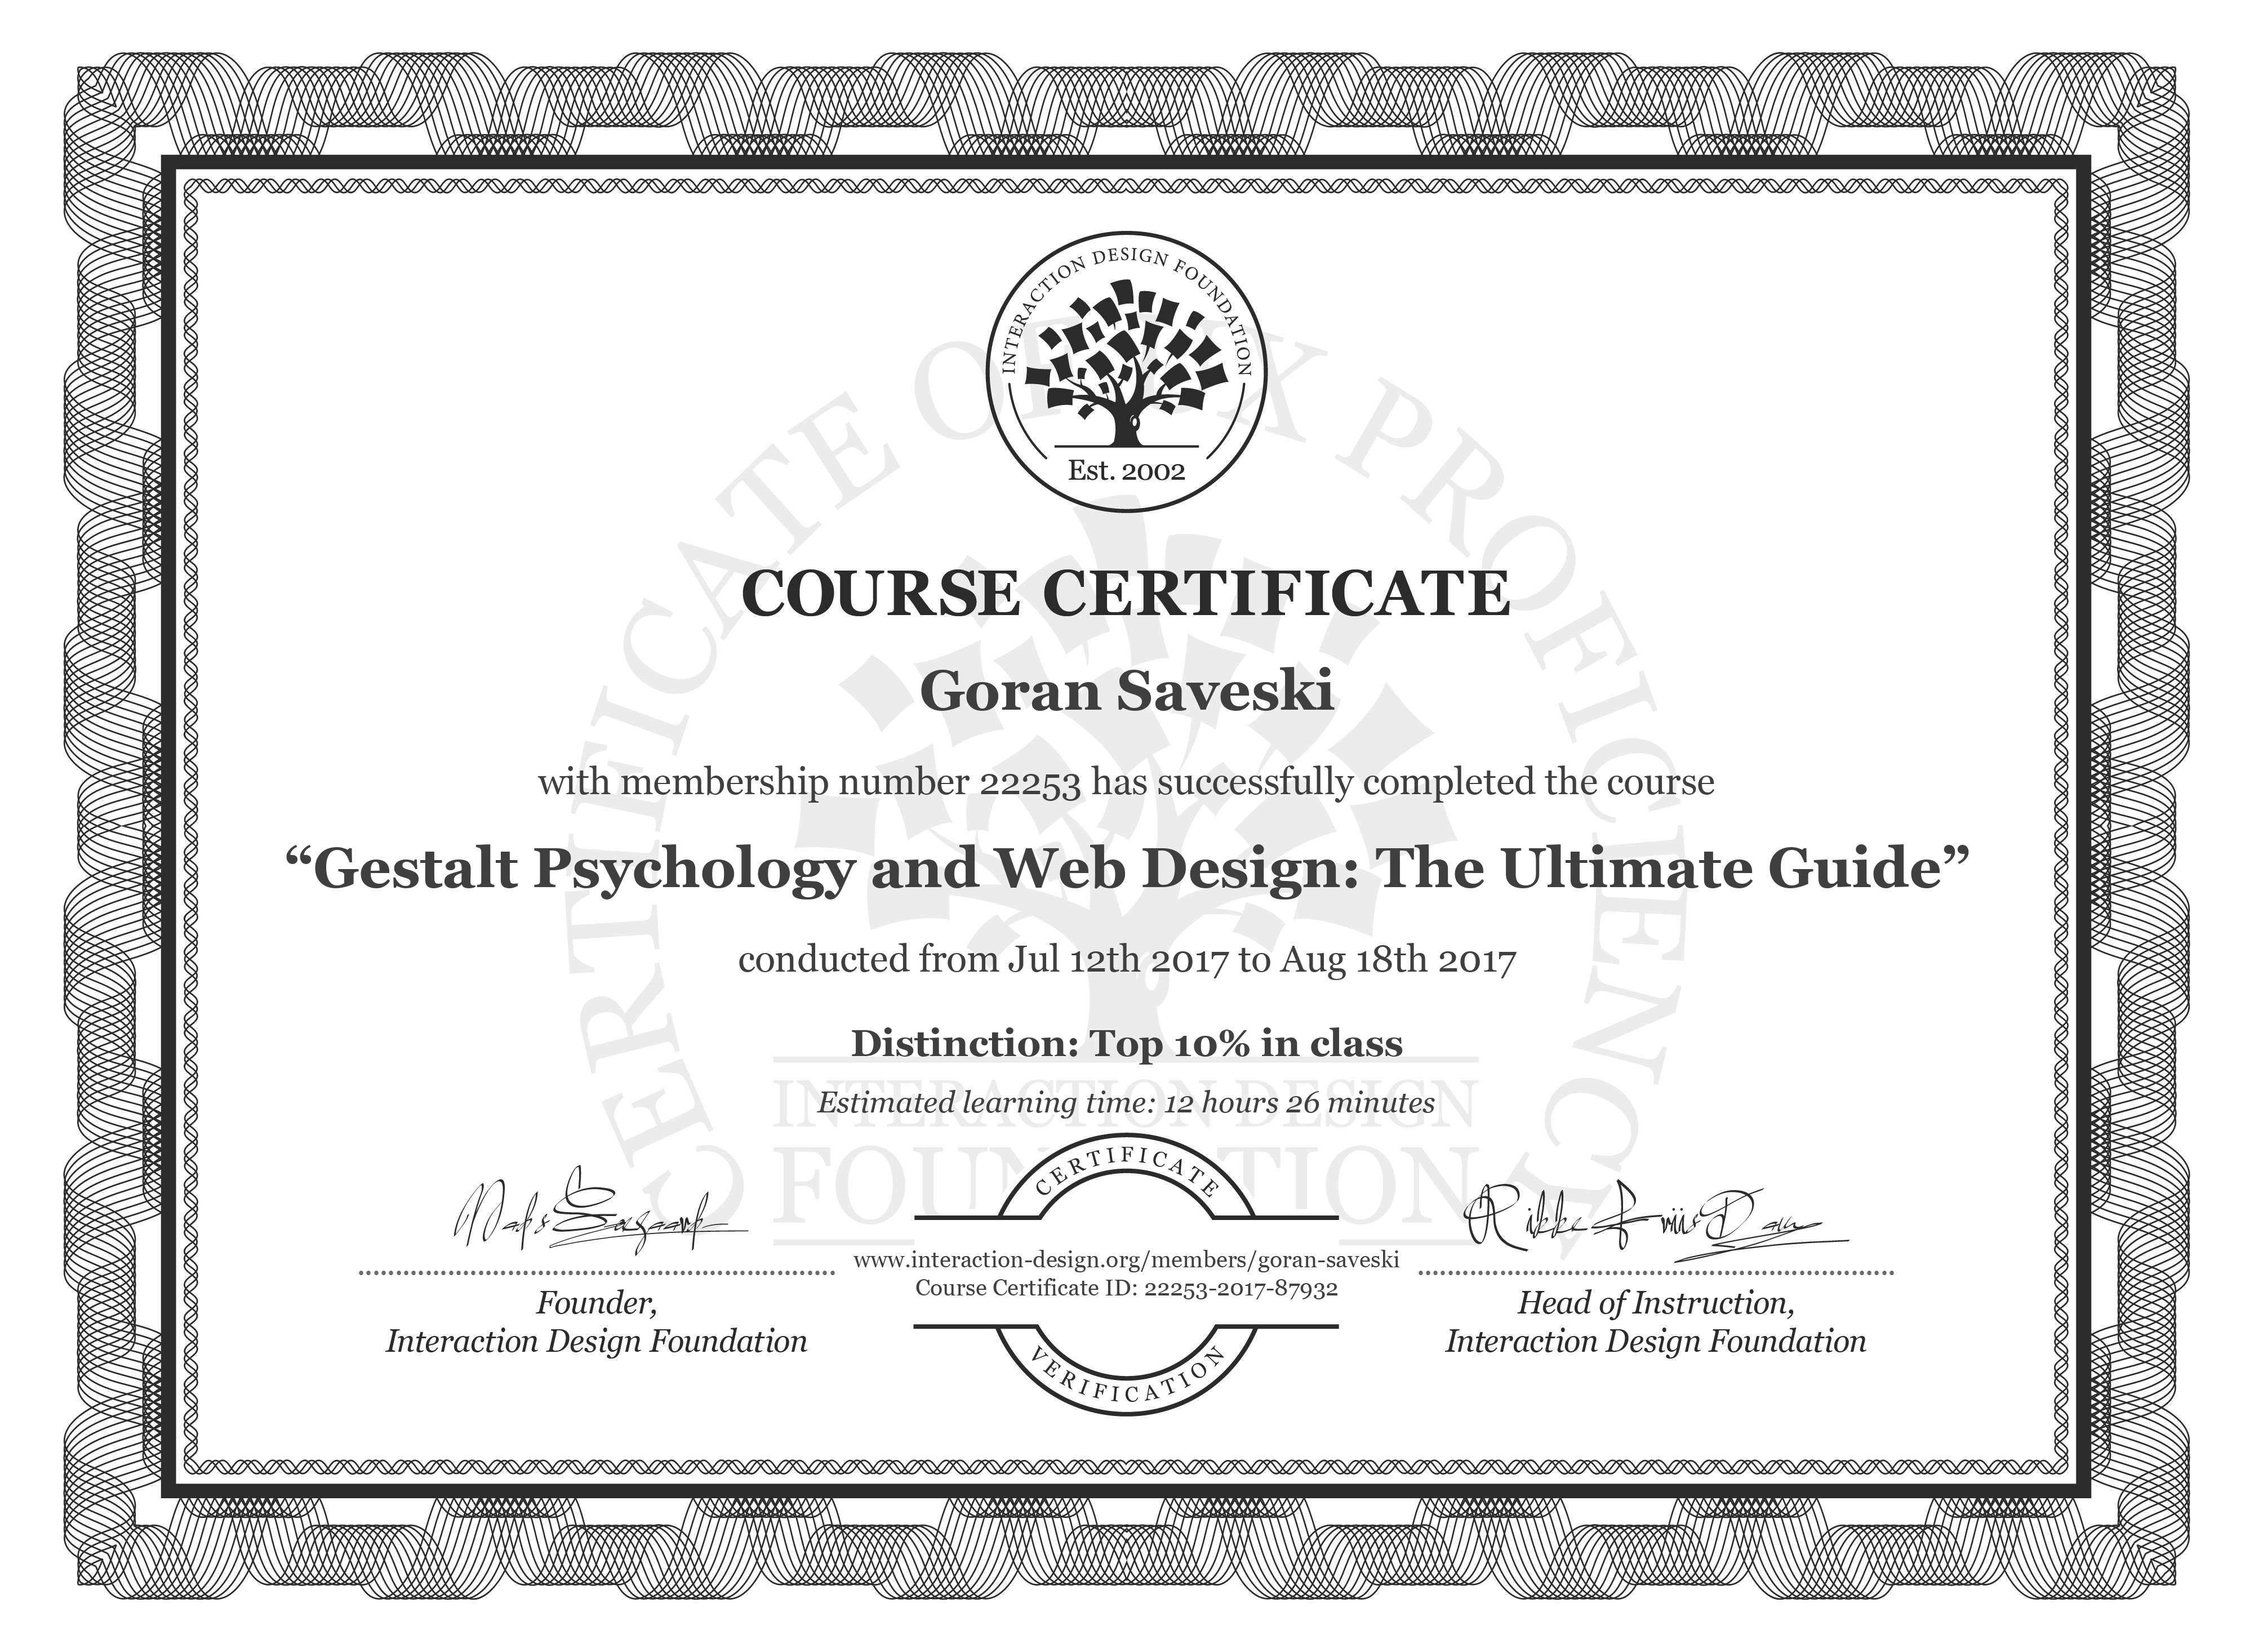 Goran Saveski: Course Certificate - Gestalt Psychology and Web Design: The Ultimate Guide